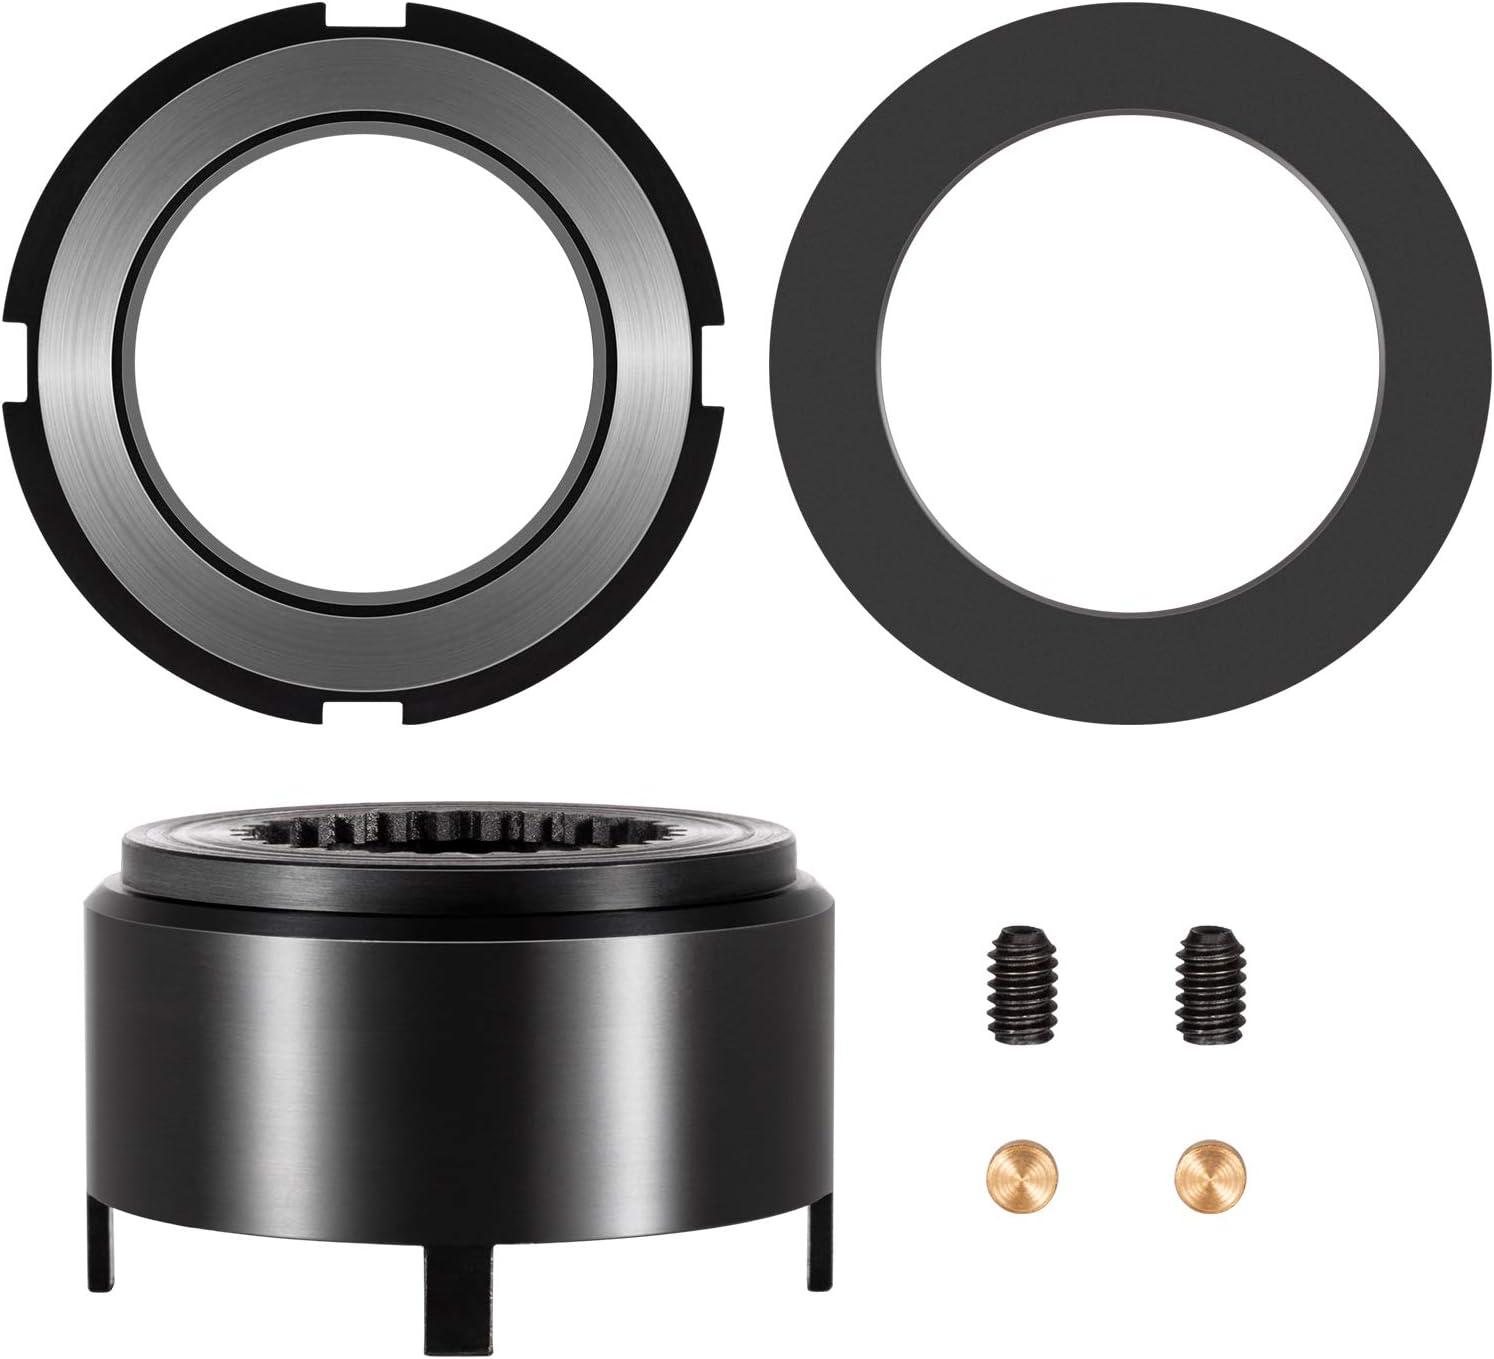 For Dodge Ram 2500 /& 3500 4x4 5th Gear Lock Nut Retainer Set 5.9L Cummins Gear Retainer/&Lock Nut